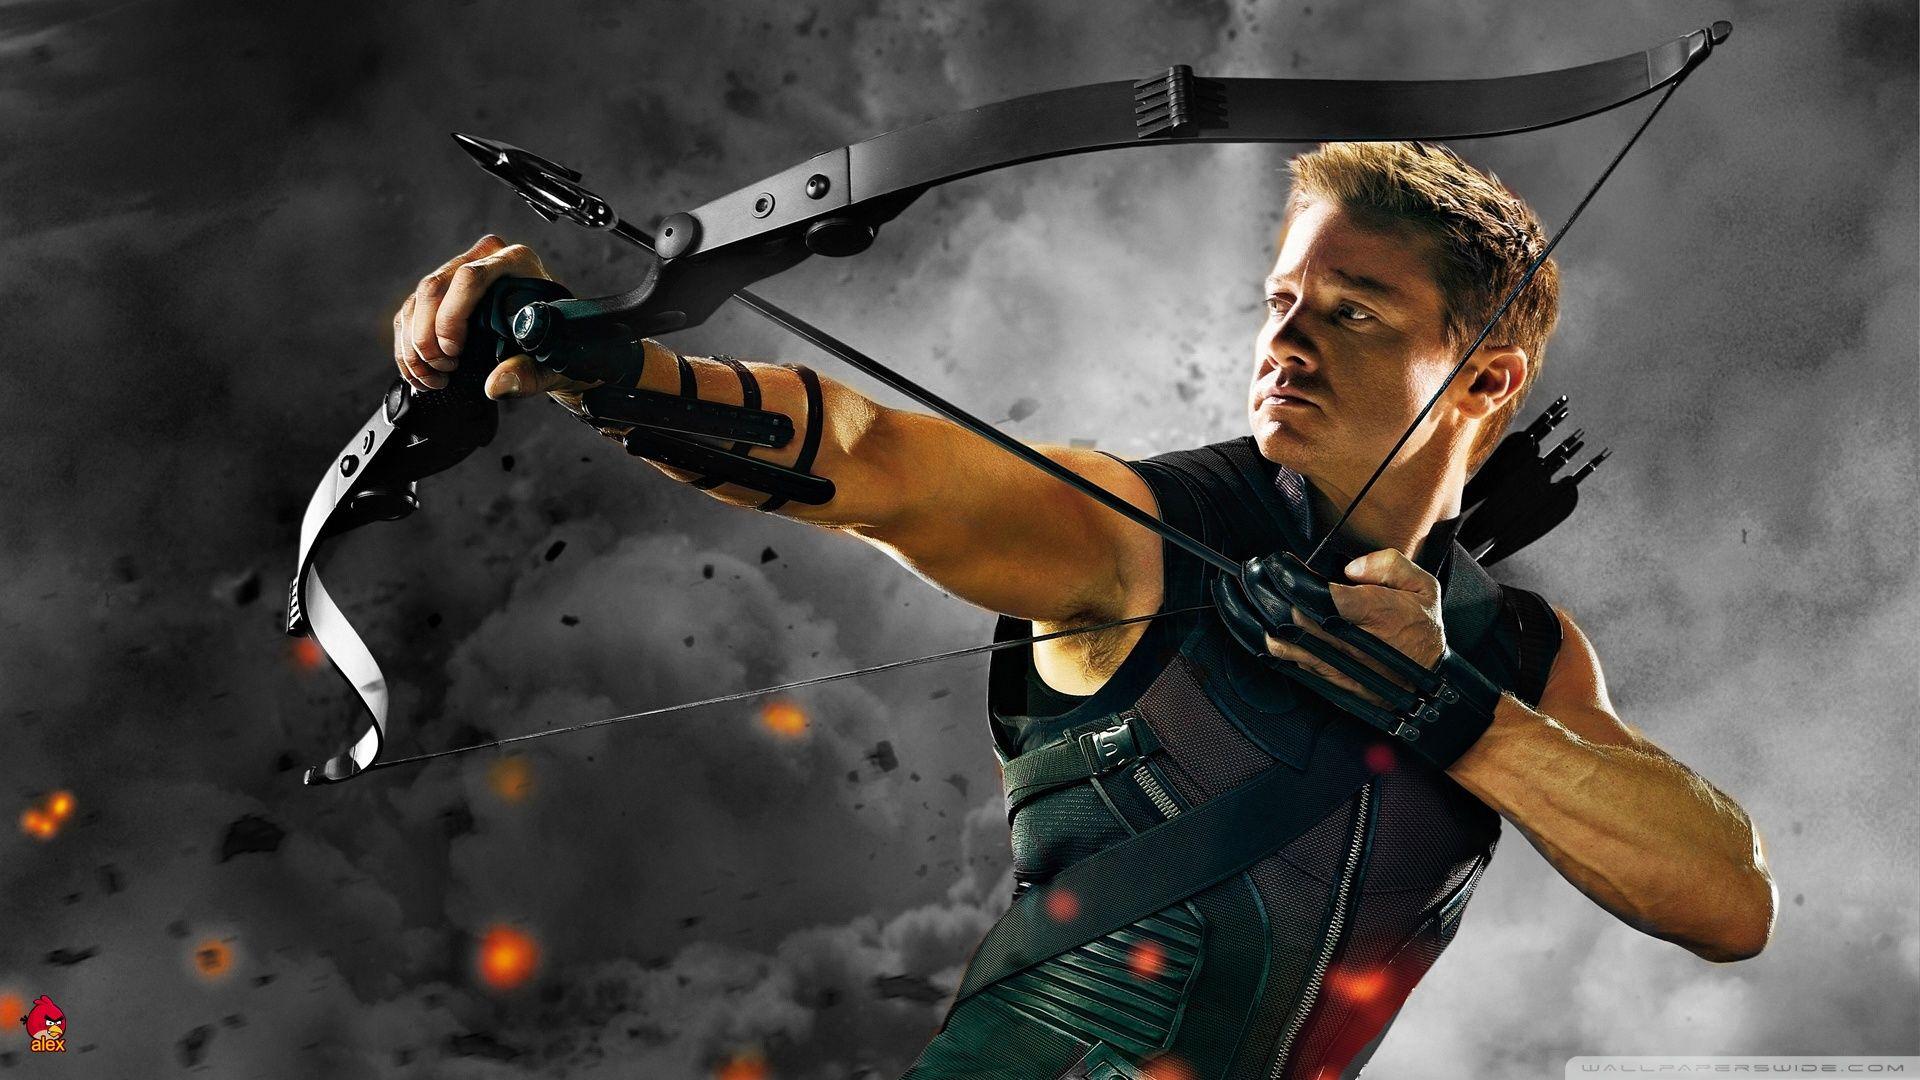 Amazing Wallpaper Marvel Hawkeye - 64dd143da392532b0e9502e361b2e1b9  Trends_624334.jpg